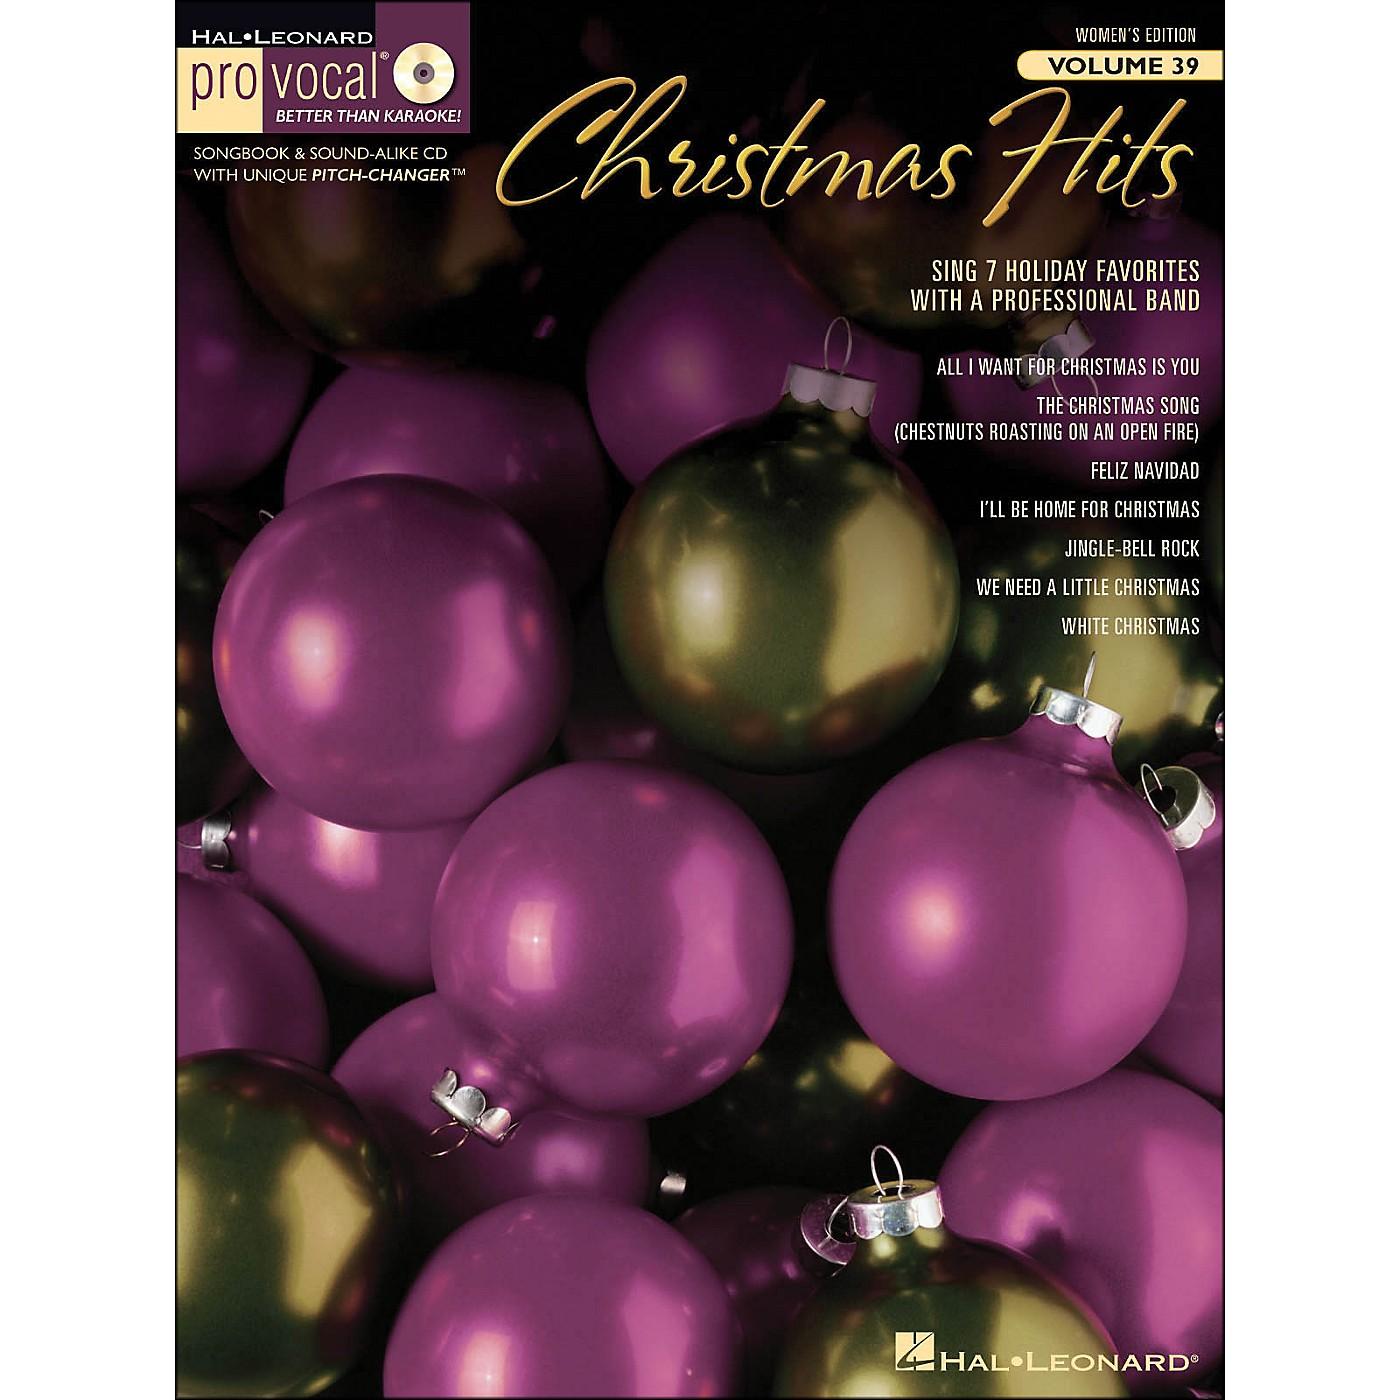 Hal Leonard Christmas Hits - Pro Vocal Songbook & CD for Female Singers Volume 39 thumbnail